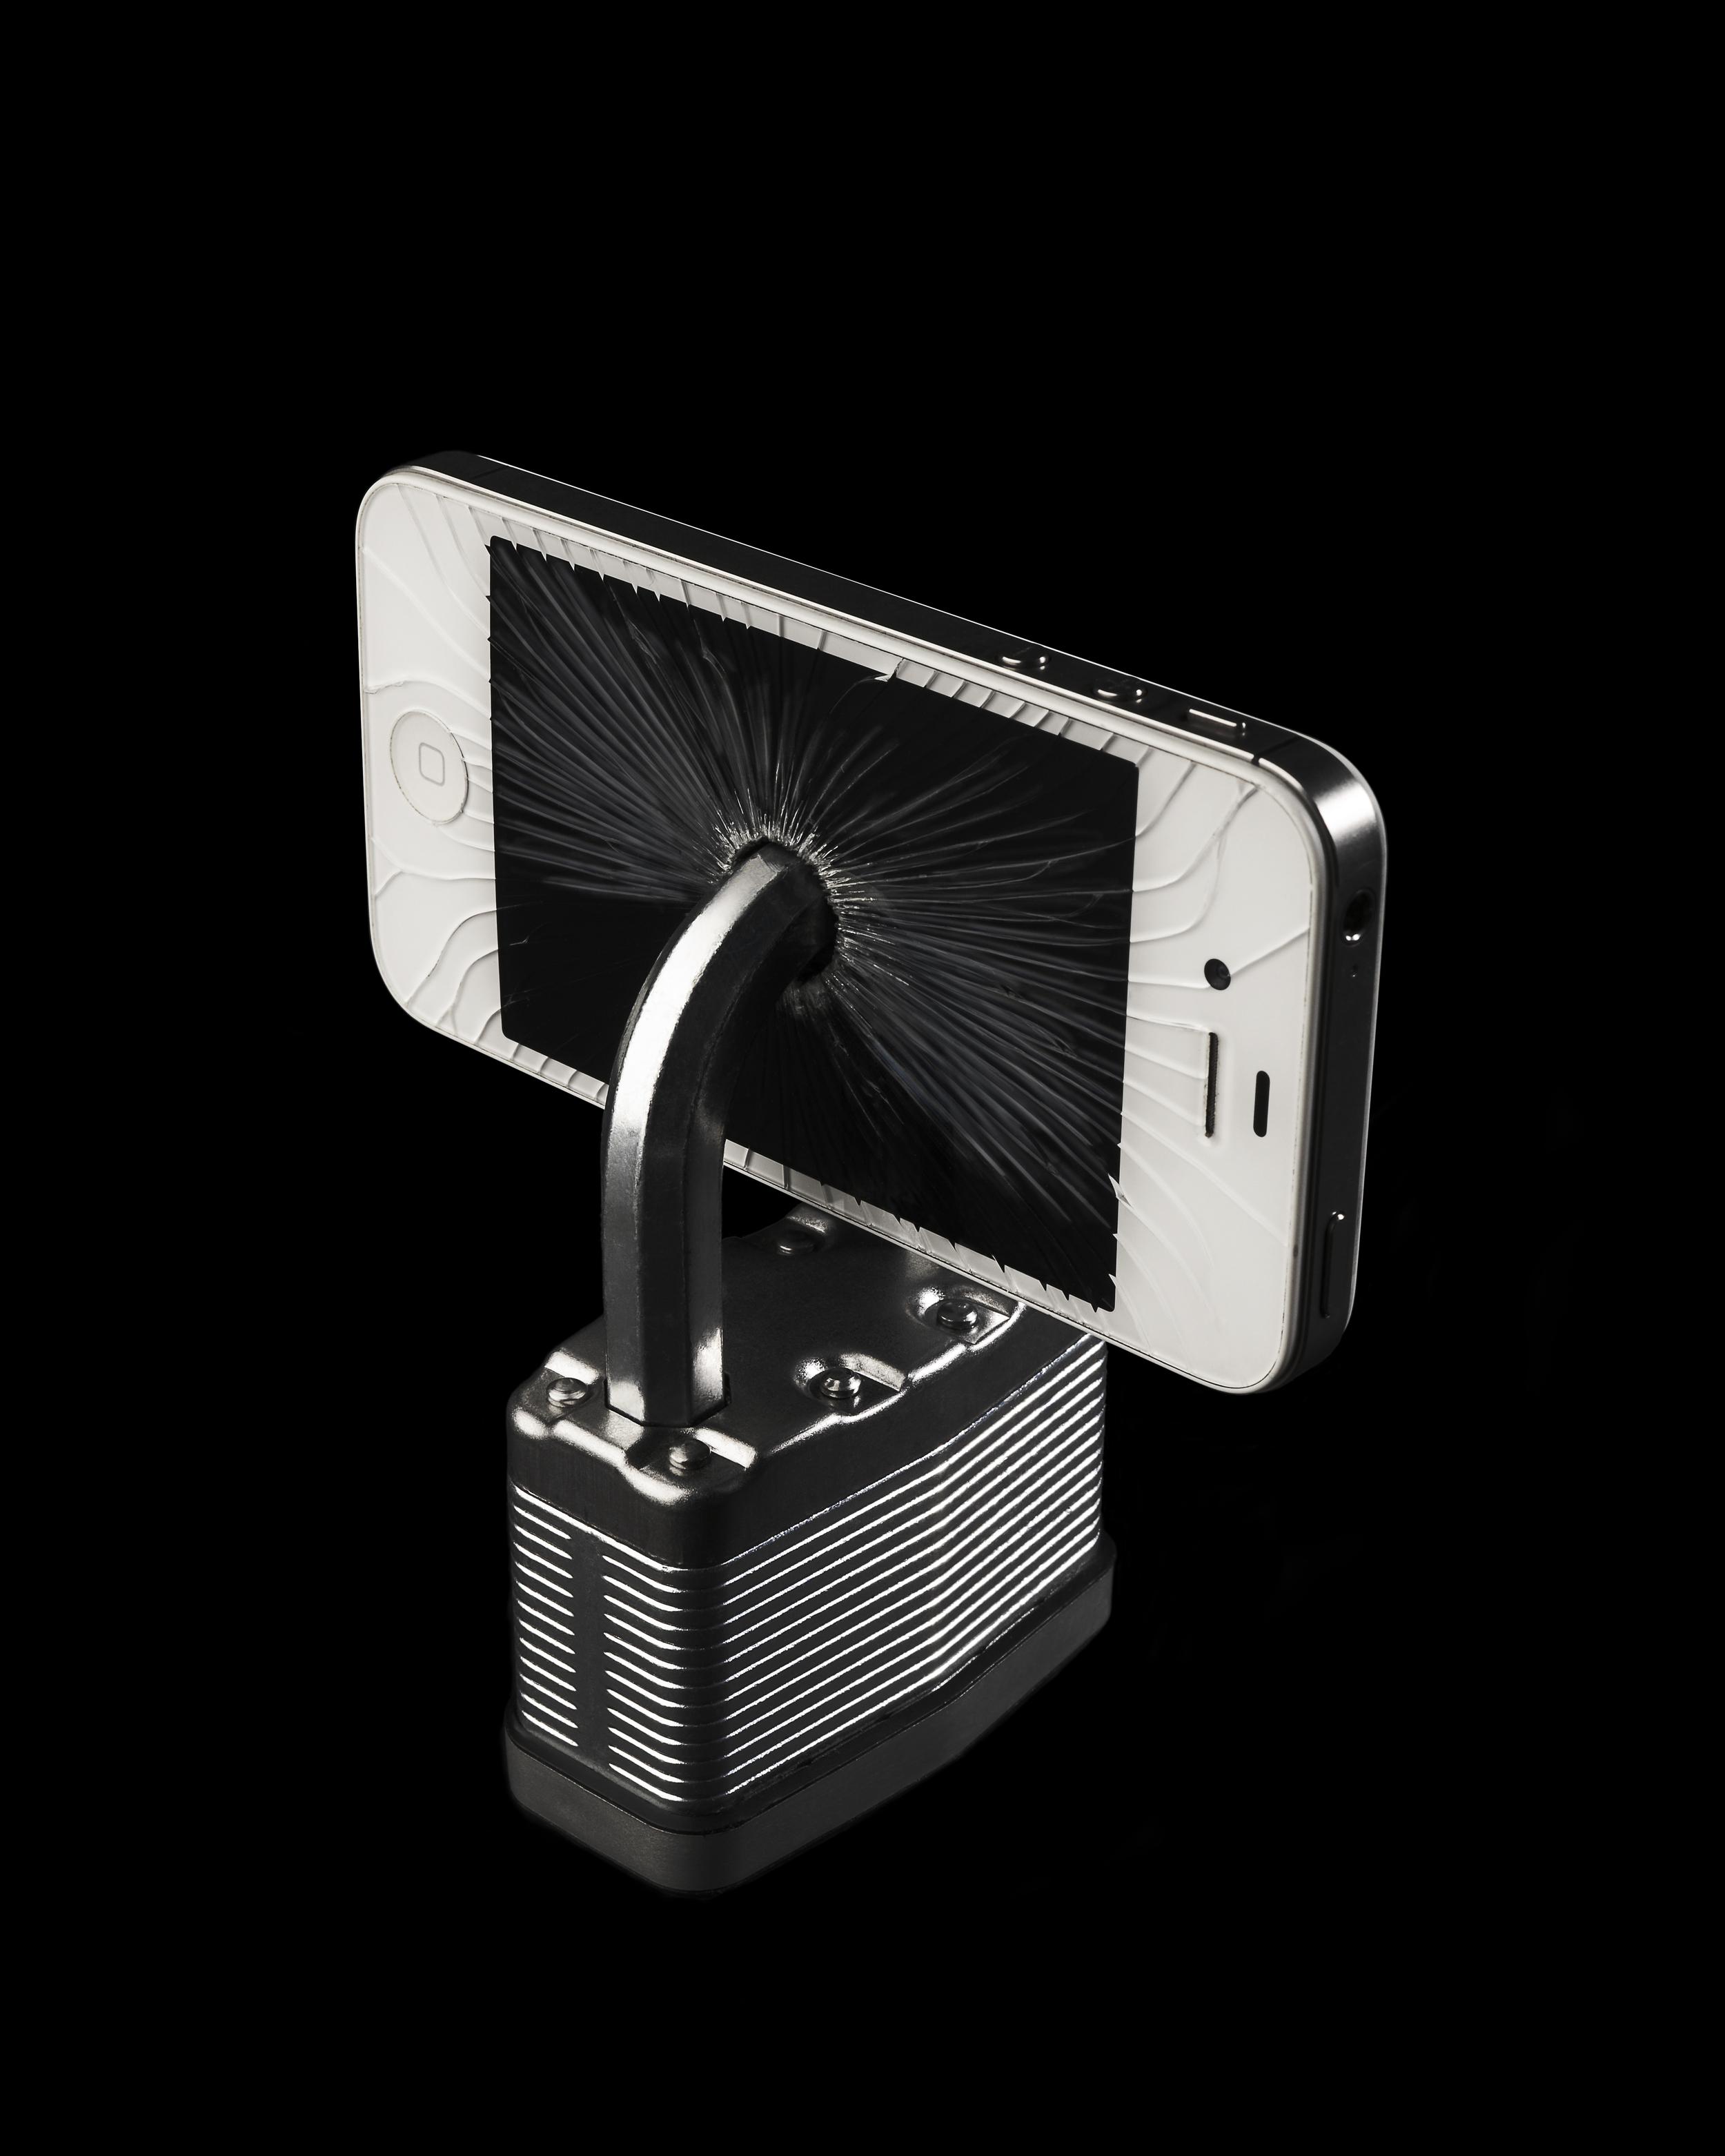 Locked IPhone5.jpg